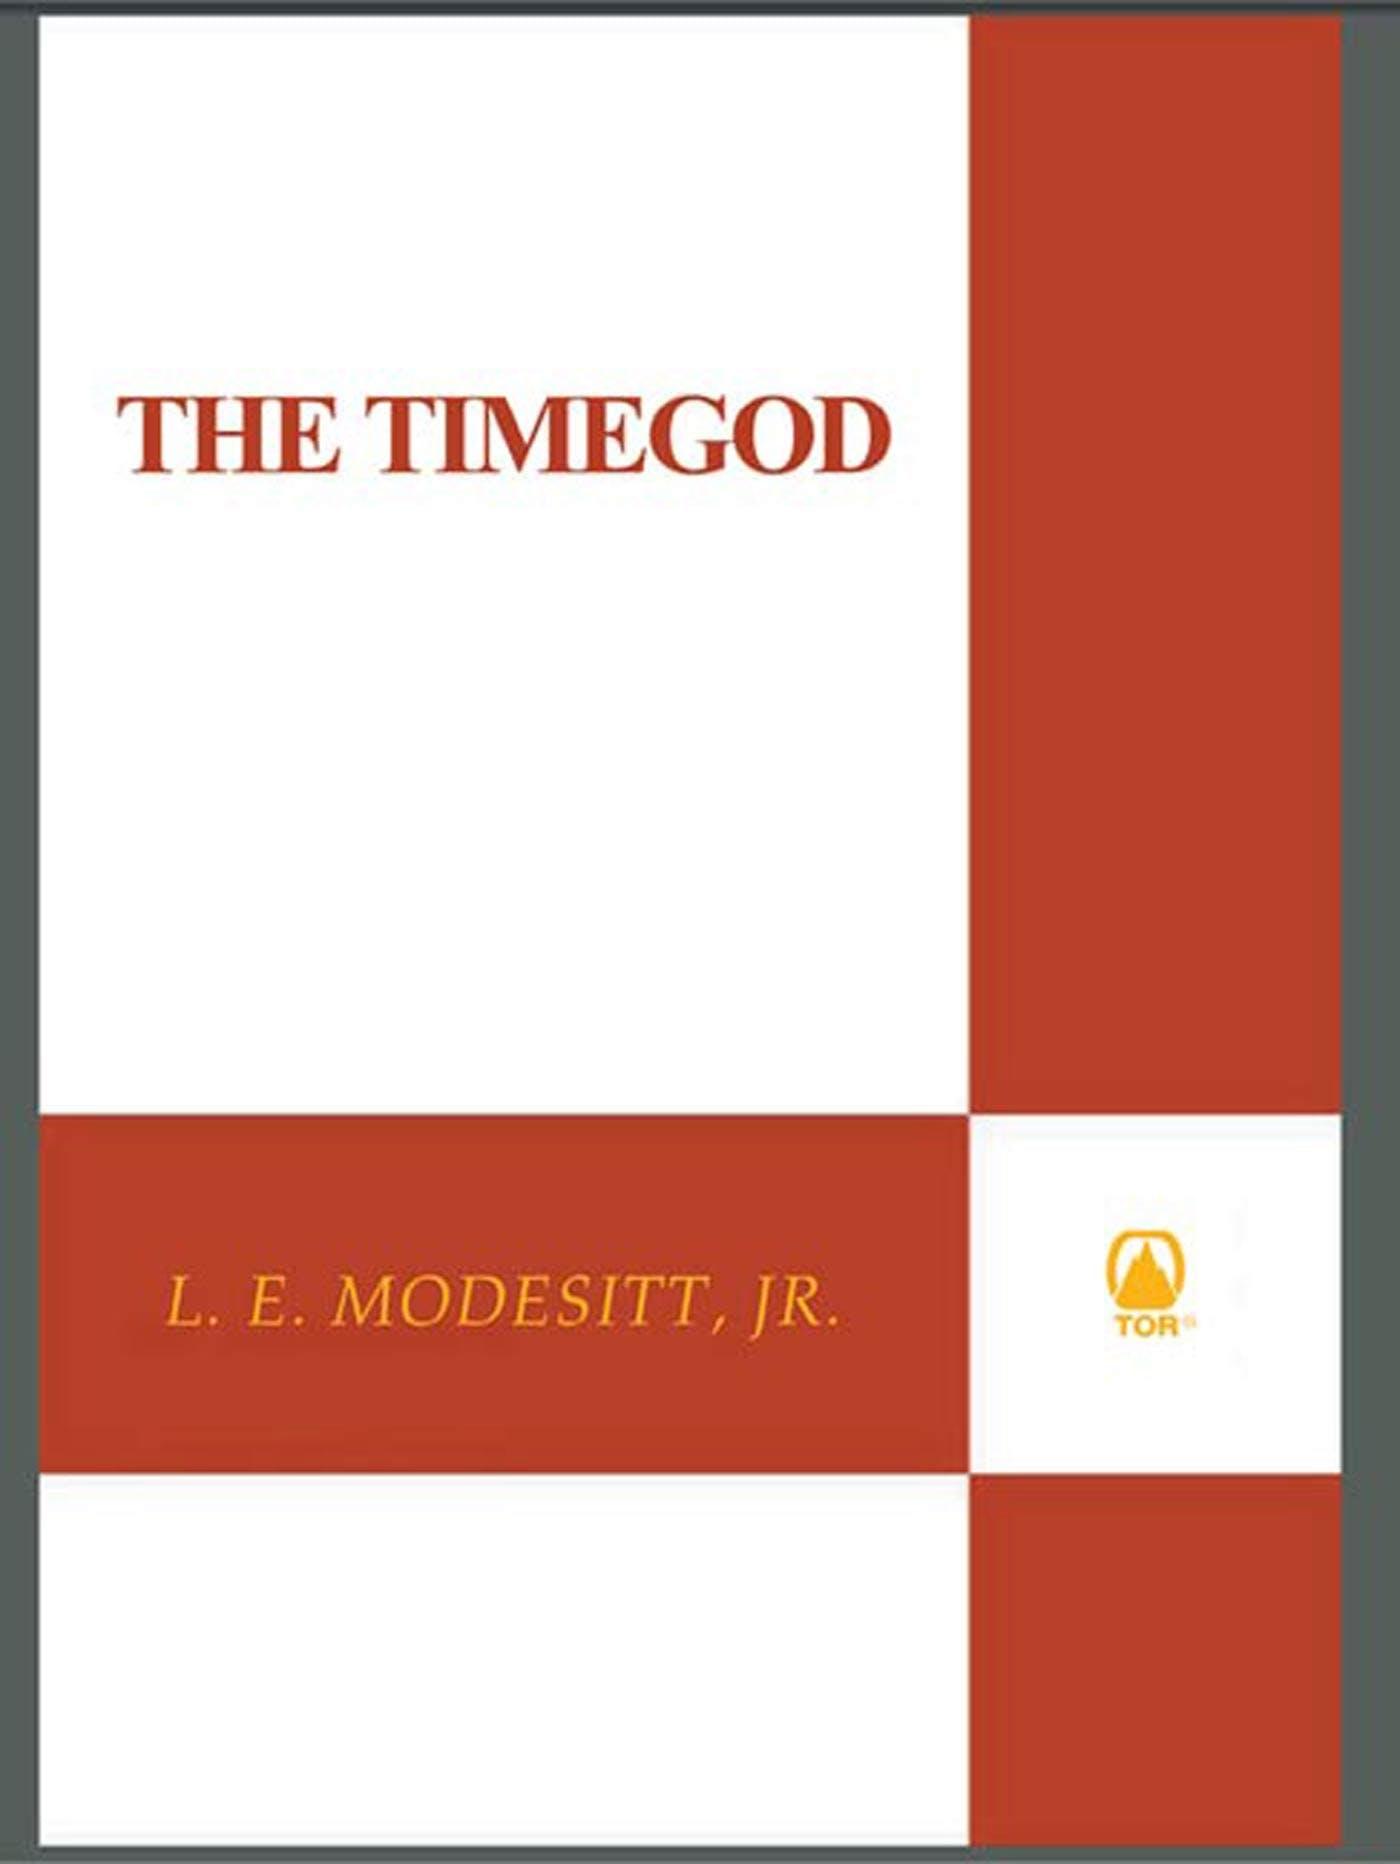 Image of The Timegod